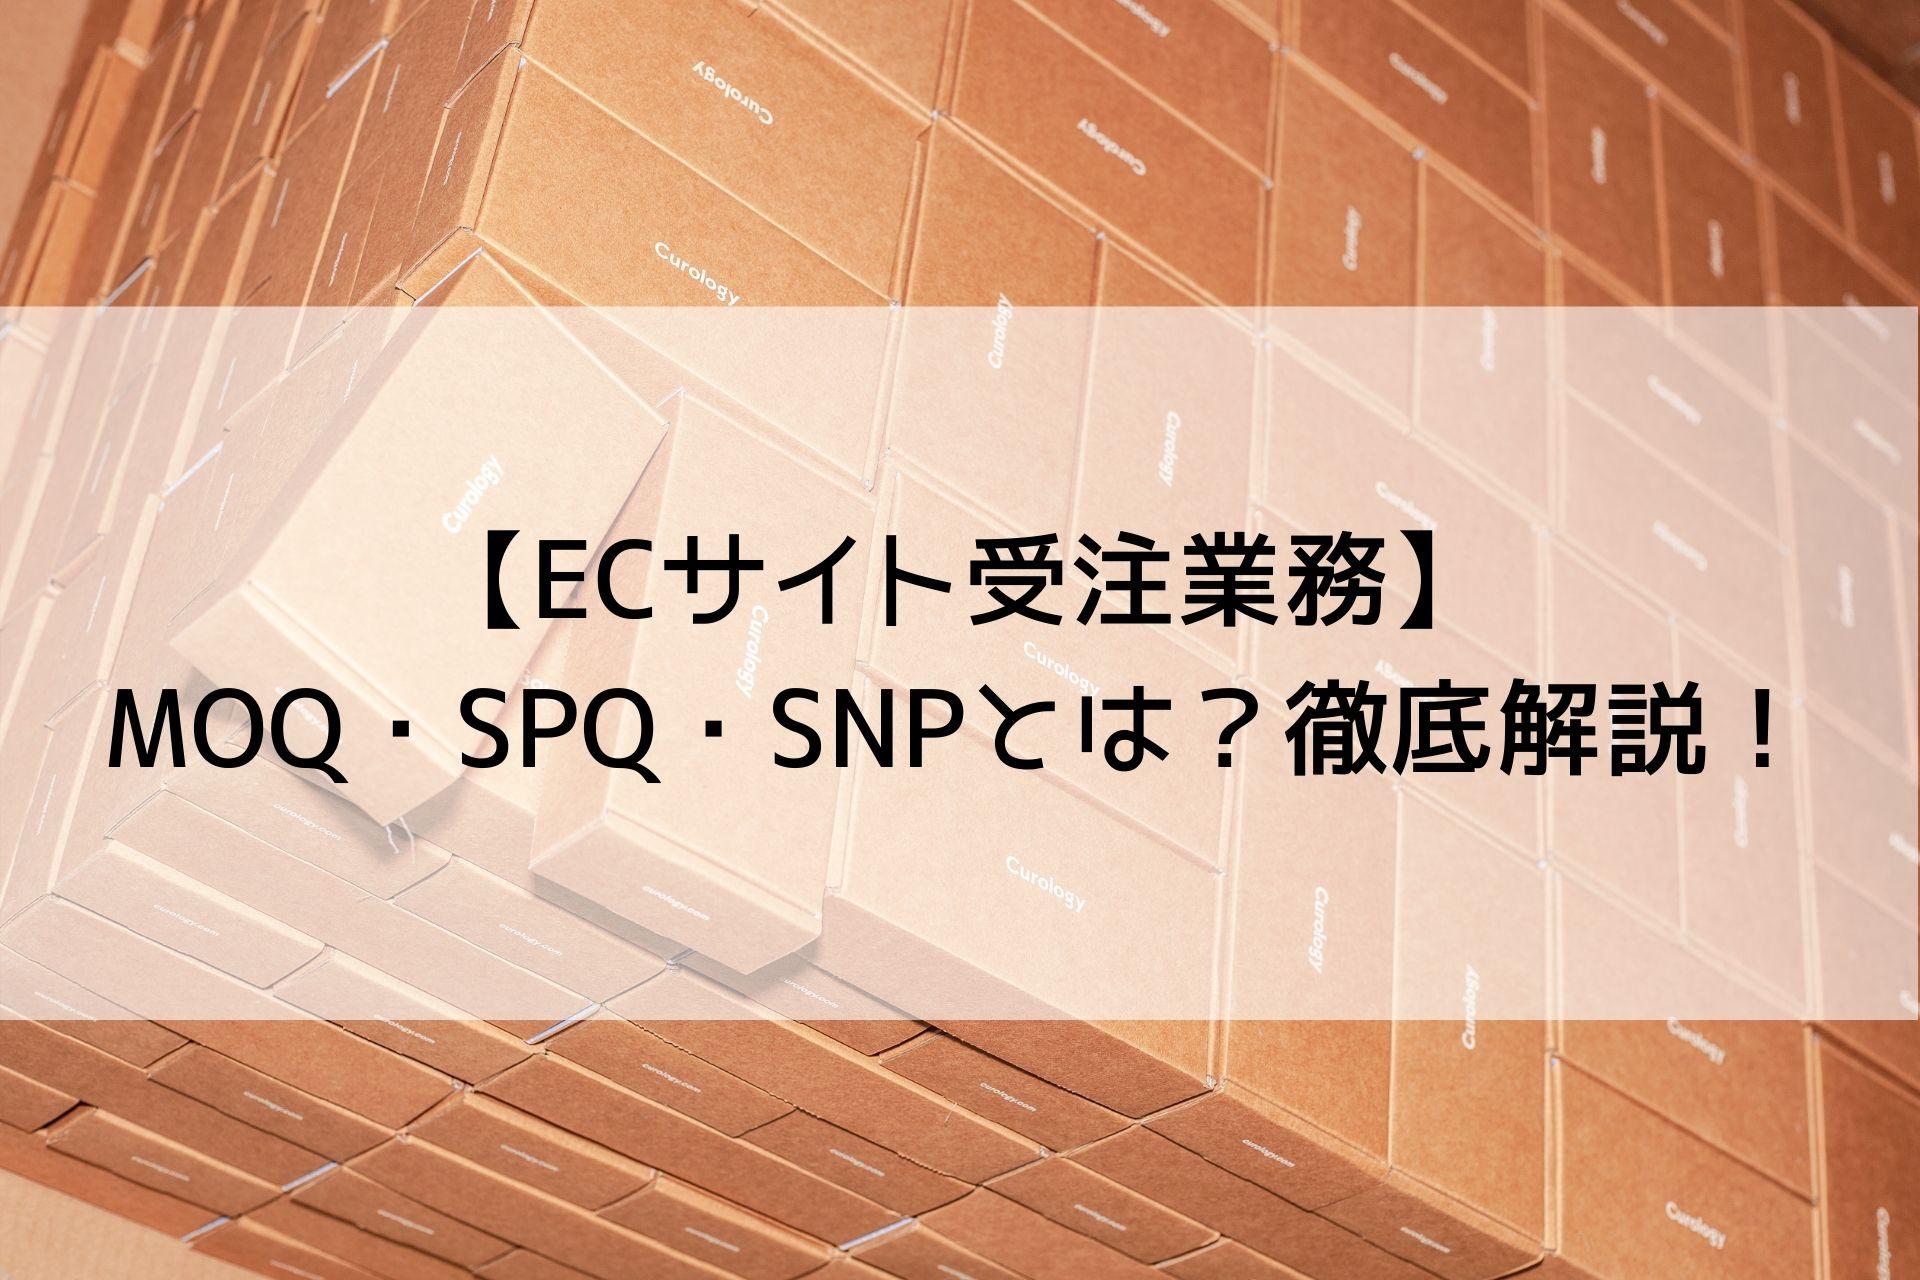 【ECサイト受注業務】MOQ・SPQ・SNPとは?徹底解説!